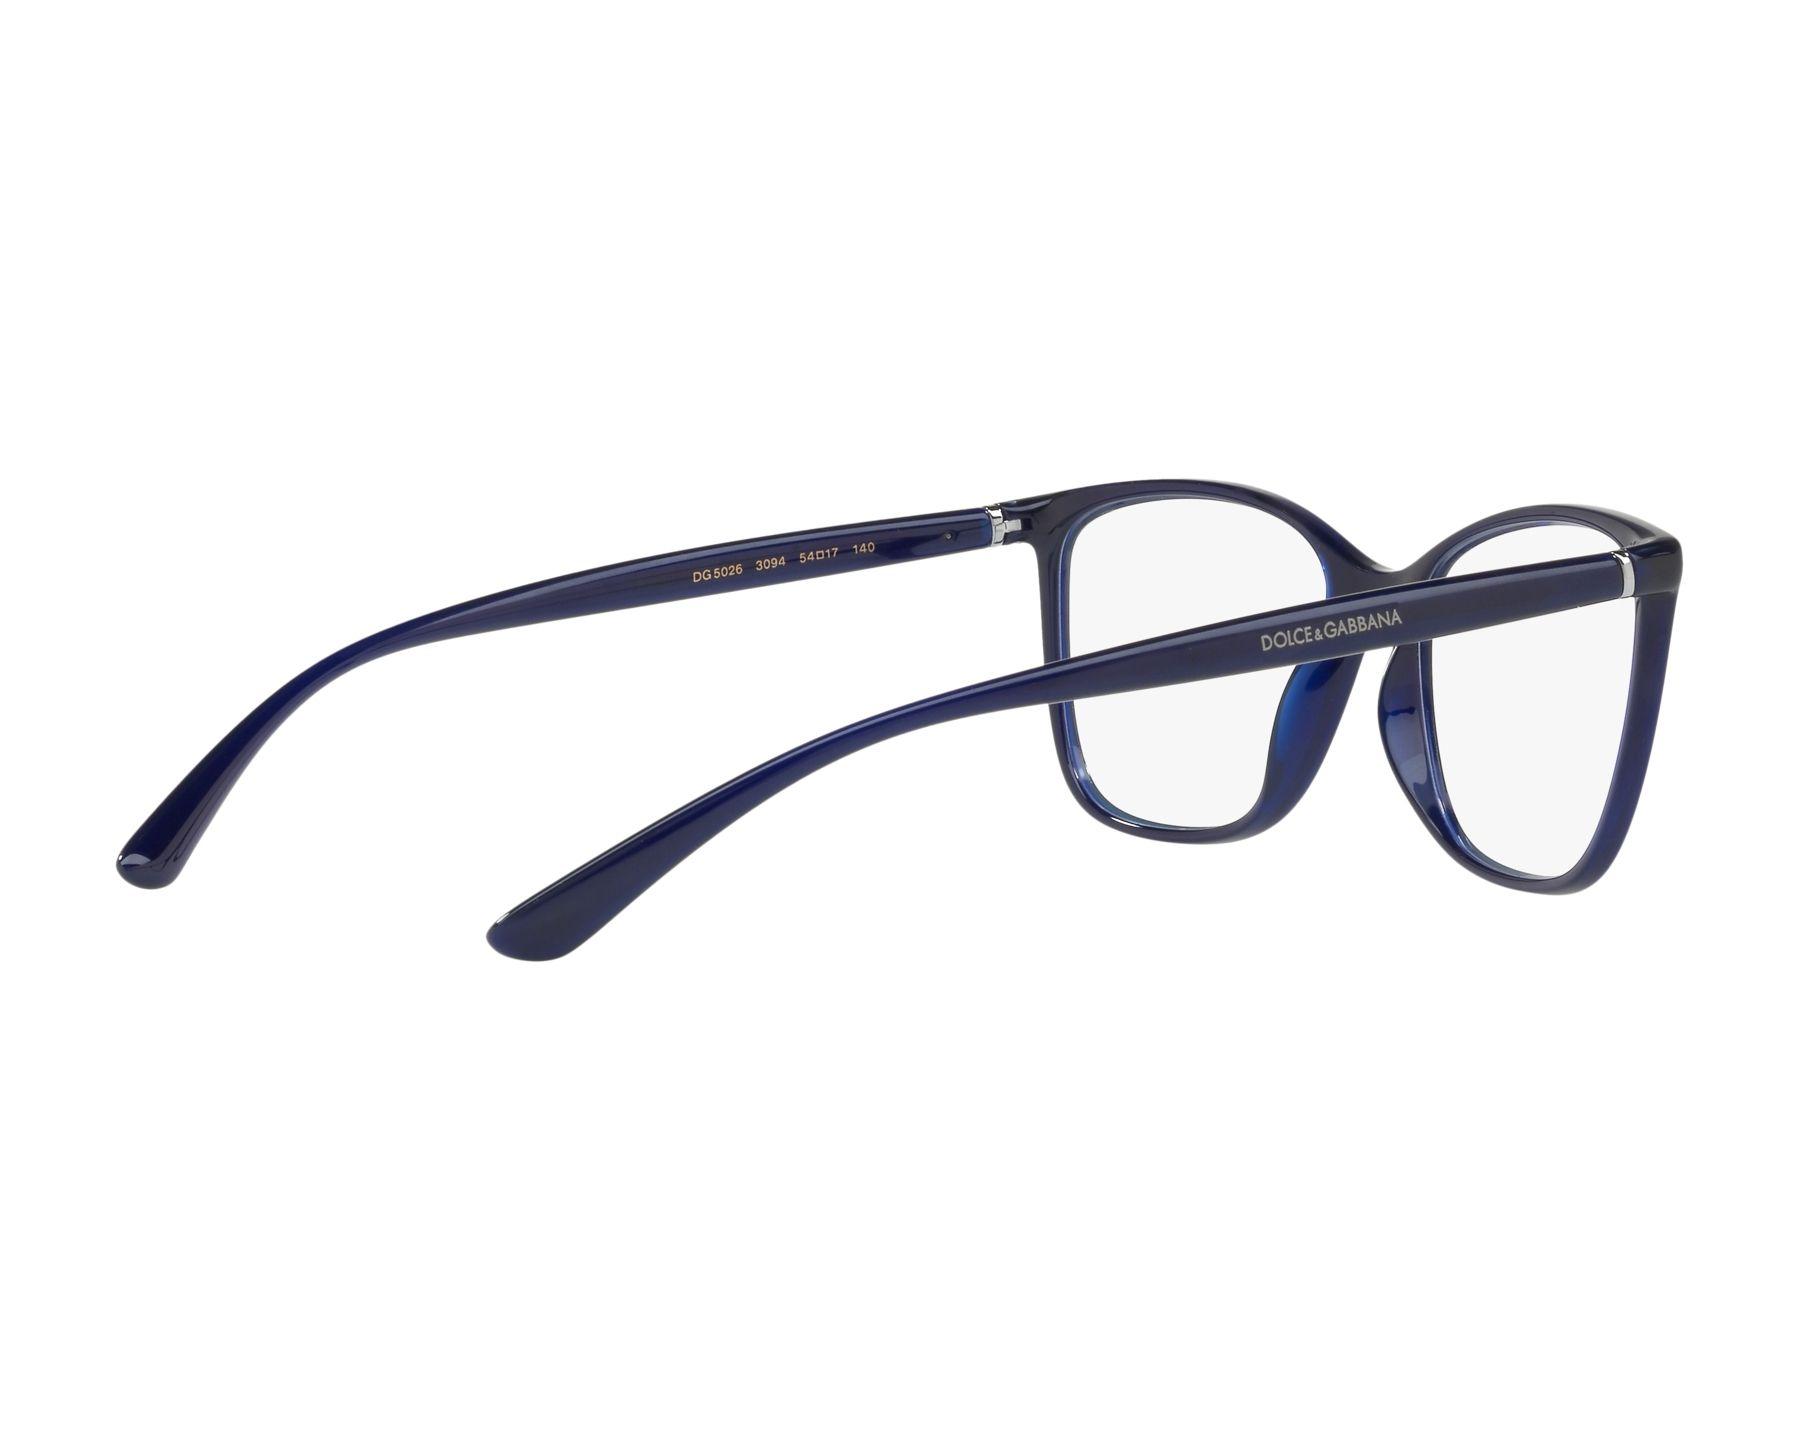 ea013d700fb eyeglasses Dolce   Gabbana DG-5026 3094 54-17 Blue 360 degree view 9